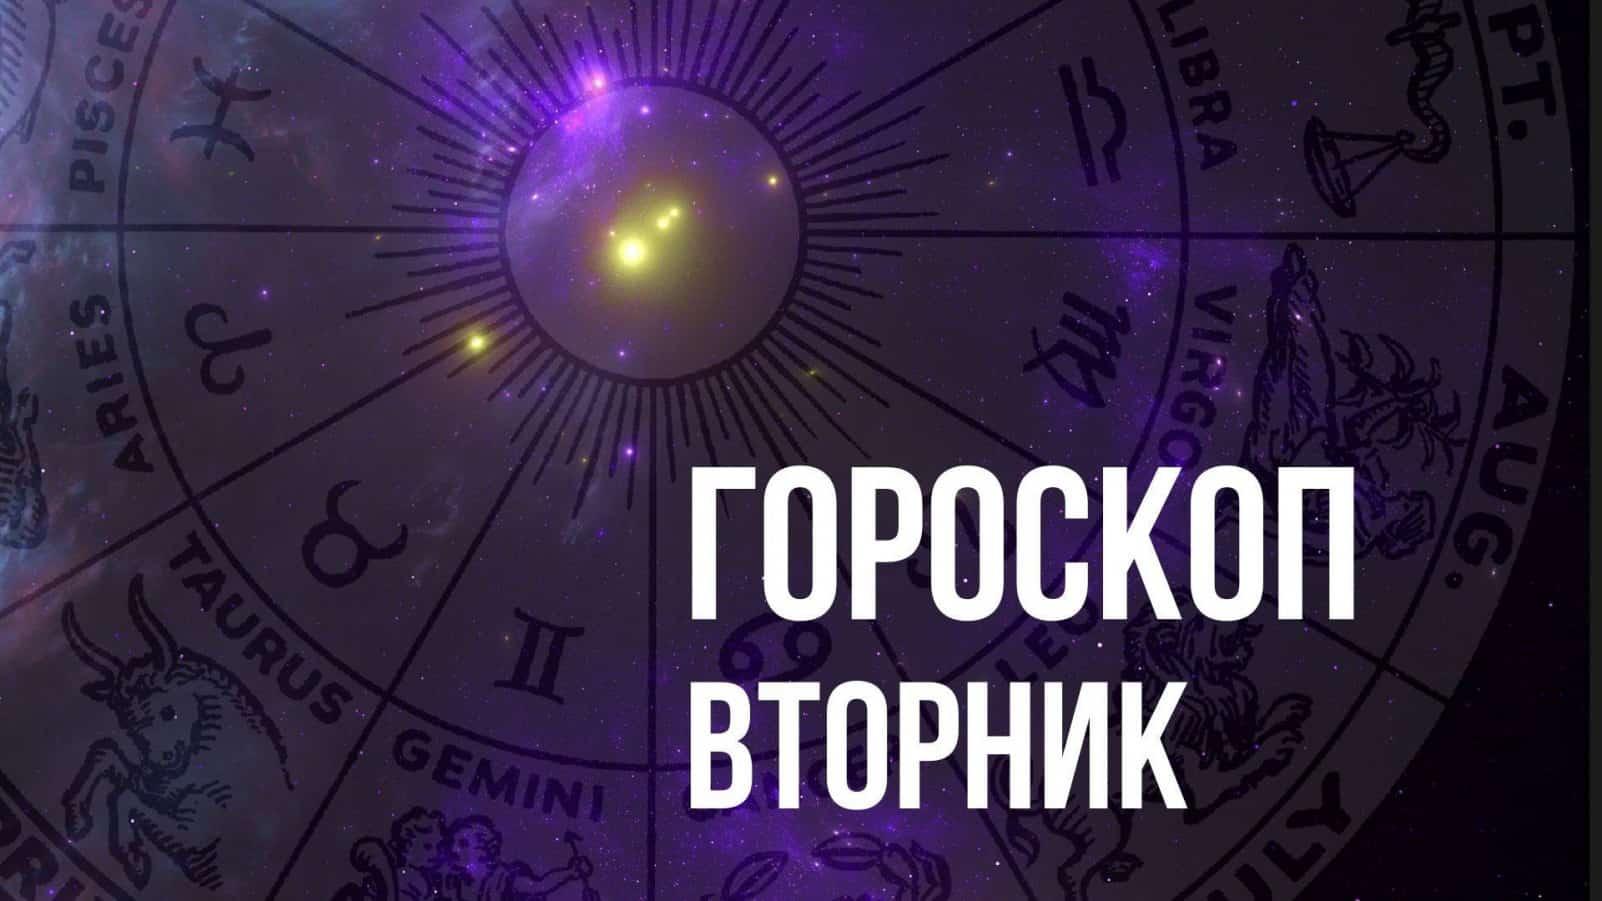 Гороскоп на вторник 3 августа для каждого знака Зодиака